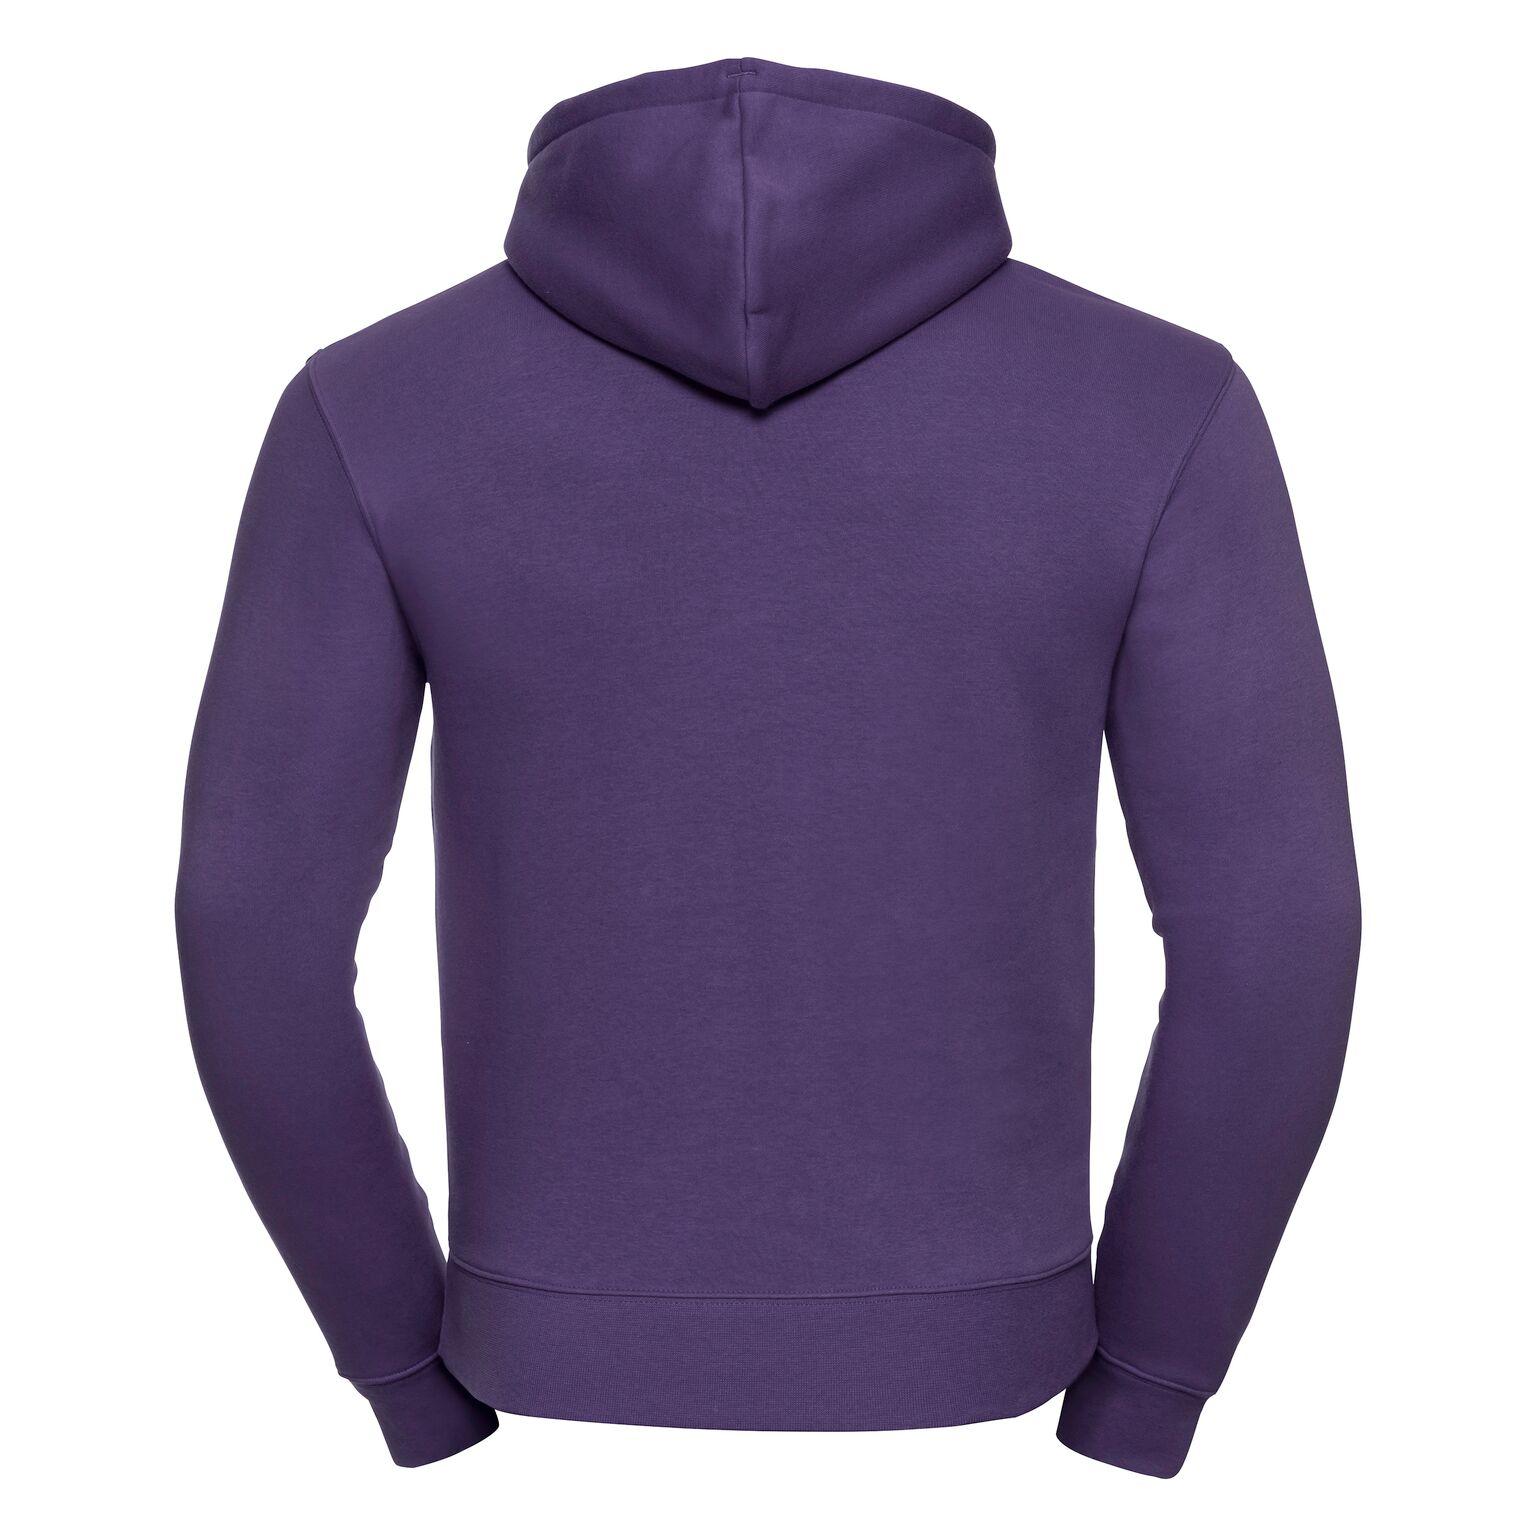 05_j265m_violet--0-0--de13c0cc-22b7-453b-99b4-a146884e56a9